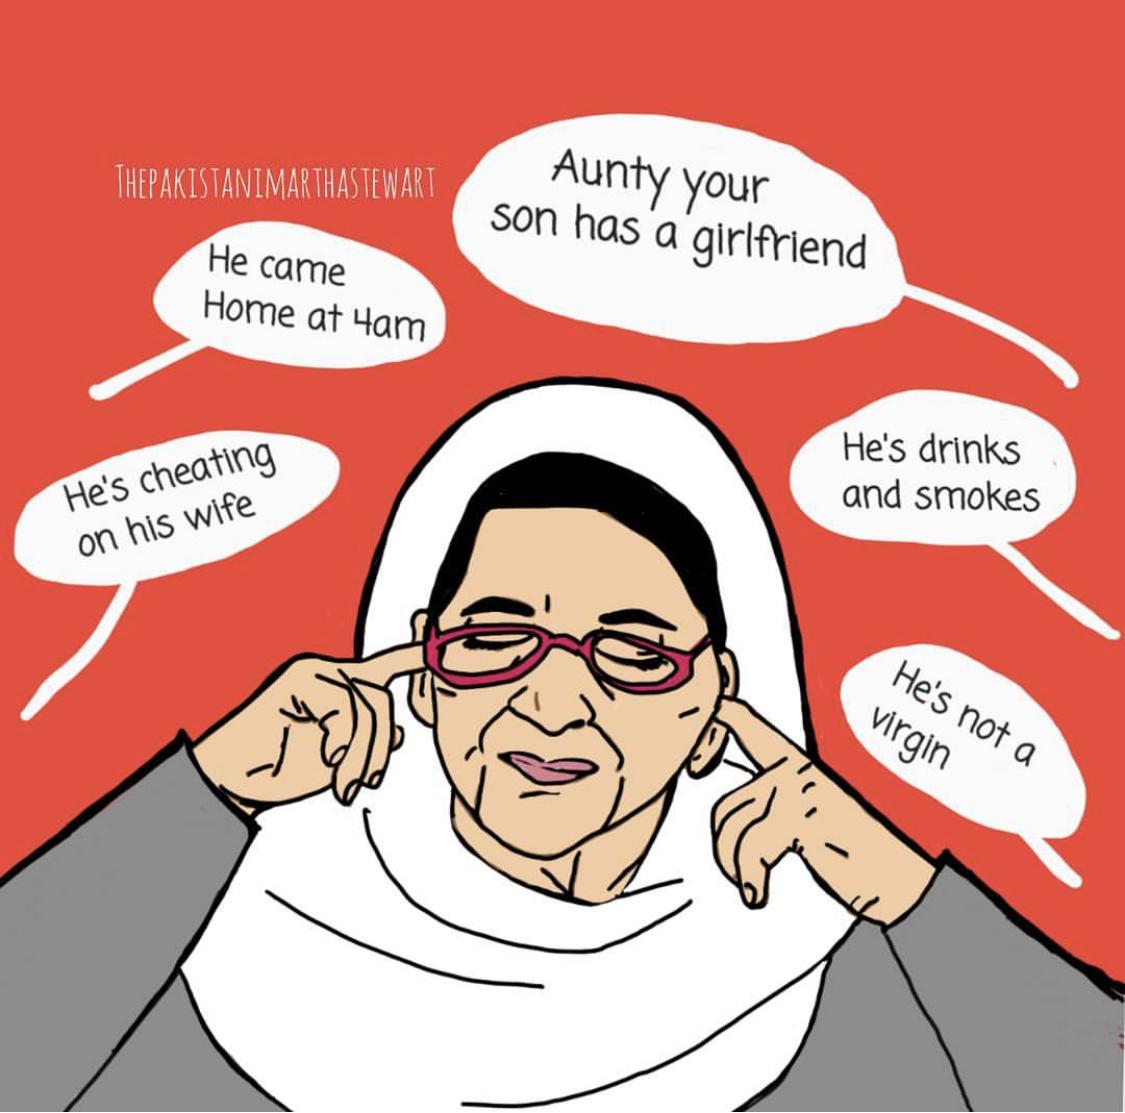 double standard (@thepakistanimarthastewart)